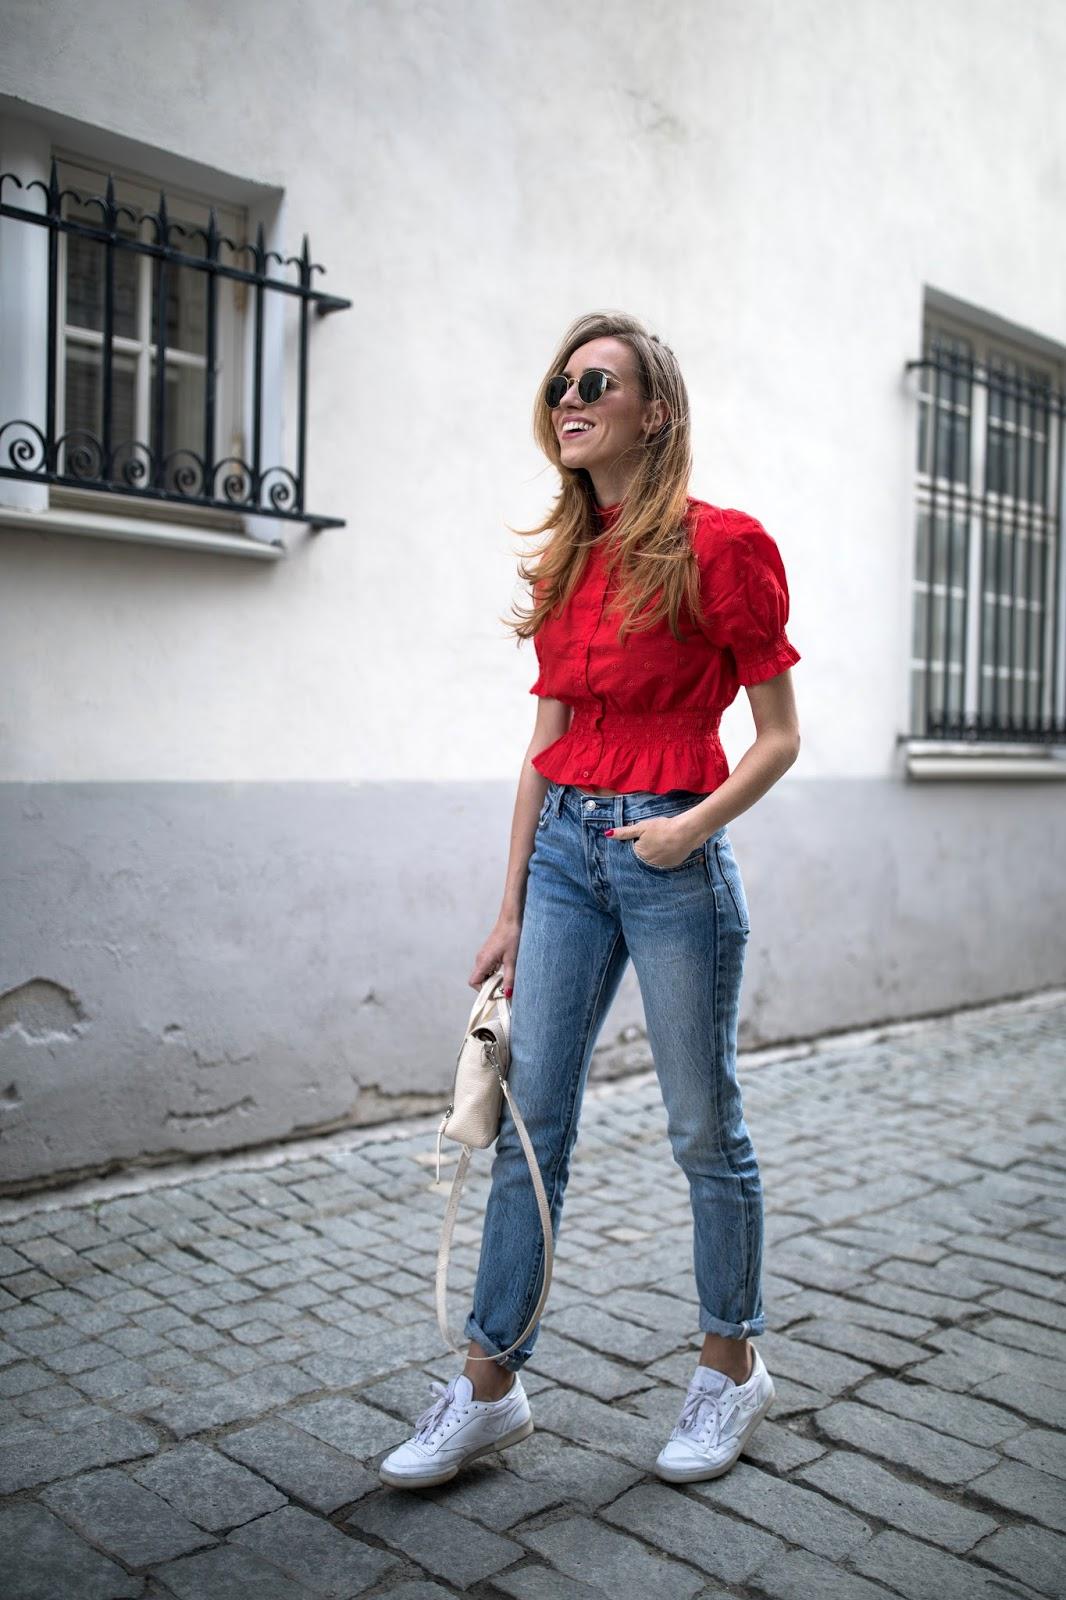 kristjaana-levis-jeans-summer-outfit